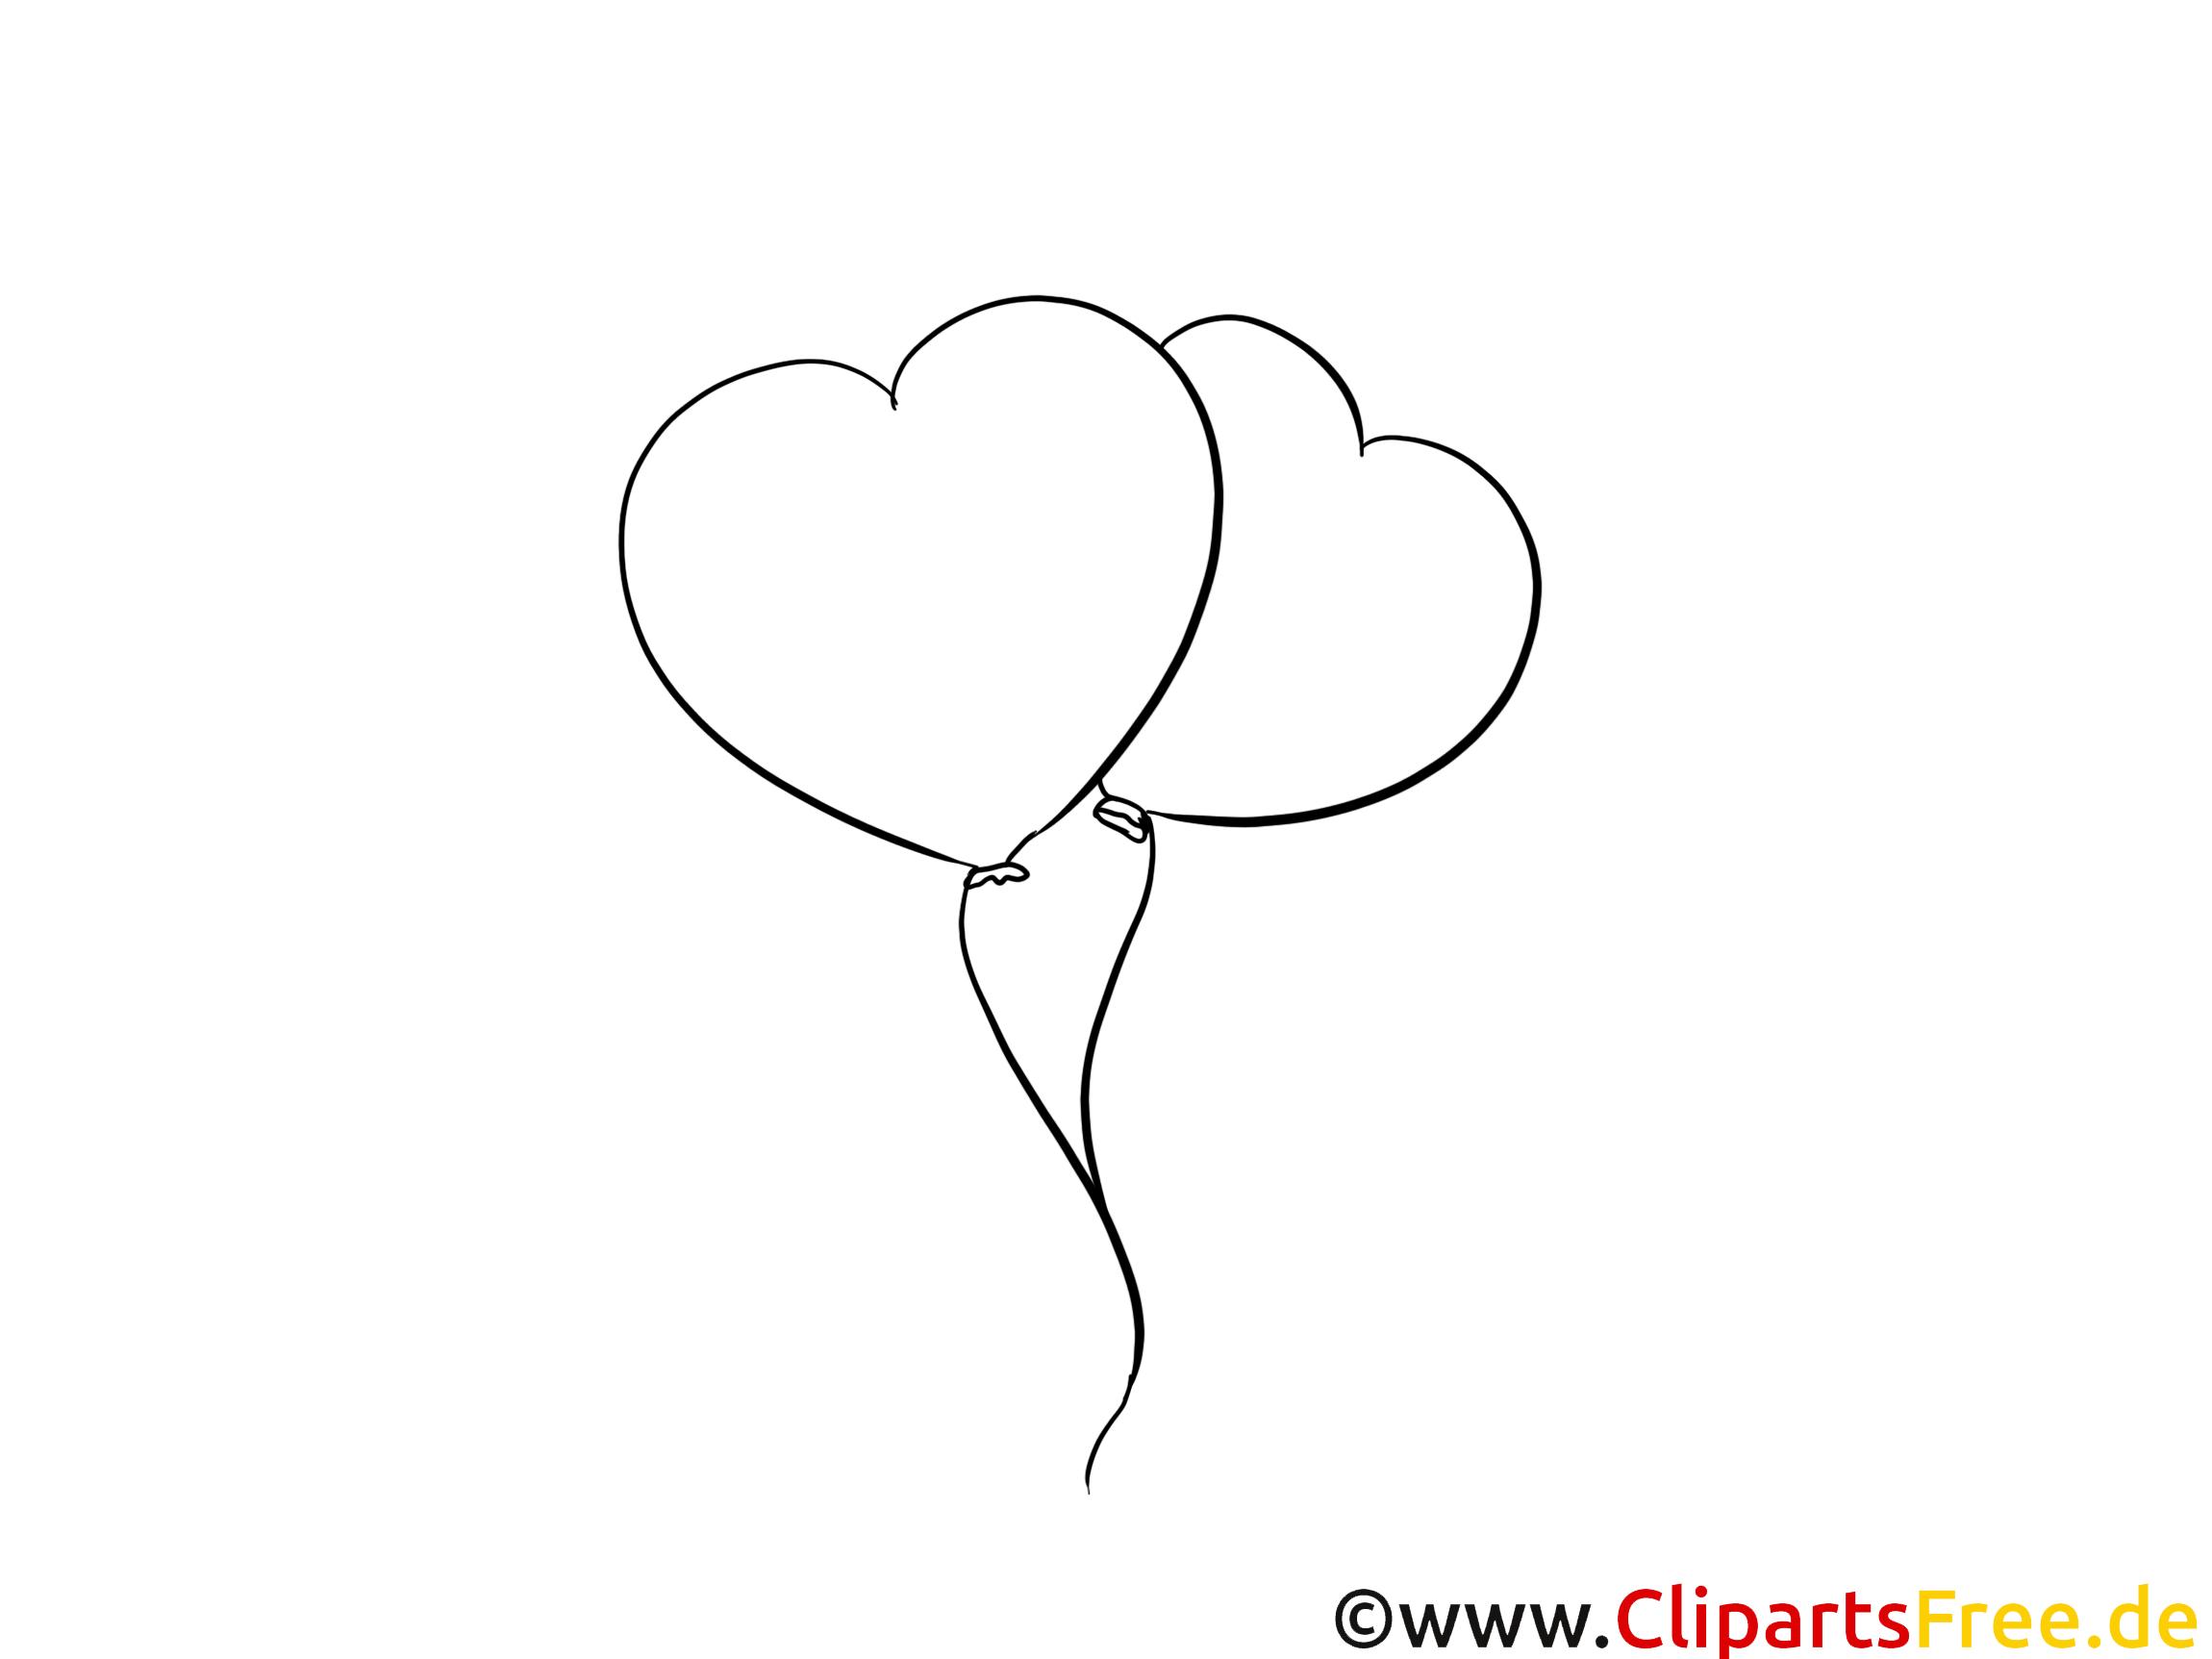 Malvorlagen Luftballon Gratis | Coloring And Malvorlagan bei Luftballon Malvorlage